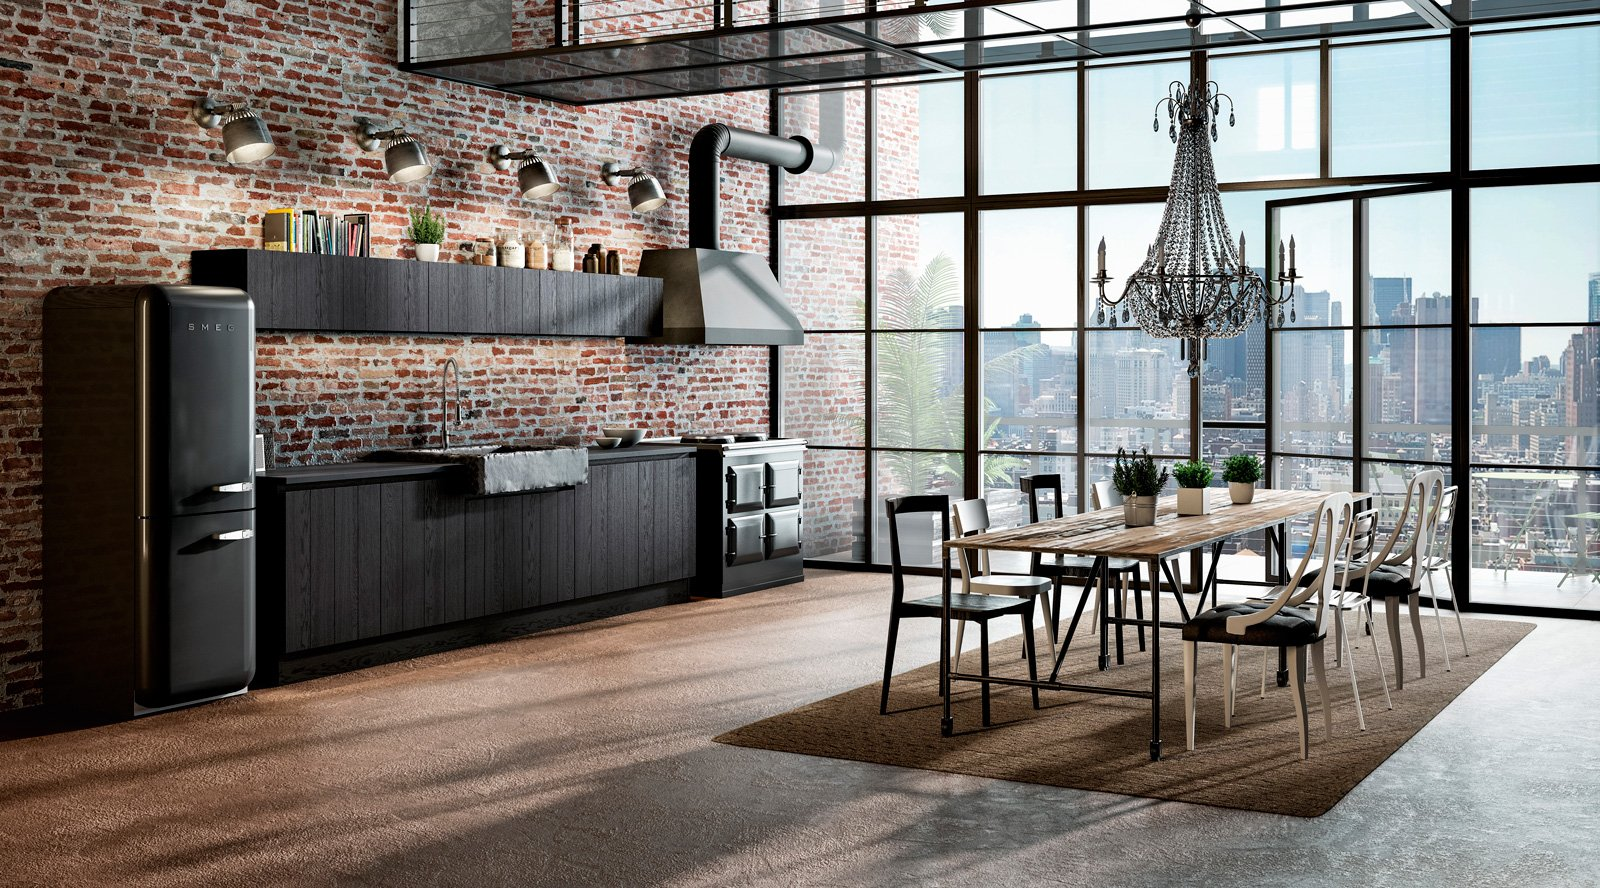 Cucine in stile industriale materiche e vissute cose di casa - Arredi particolari per casa ...